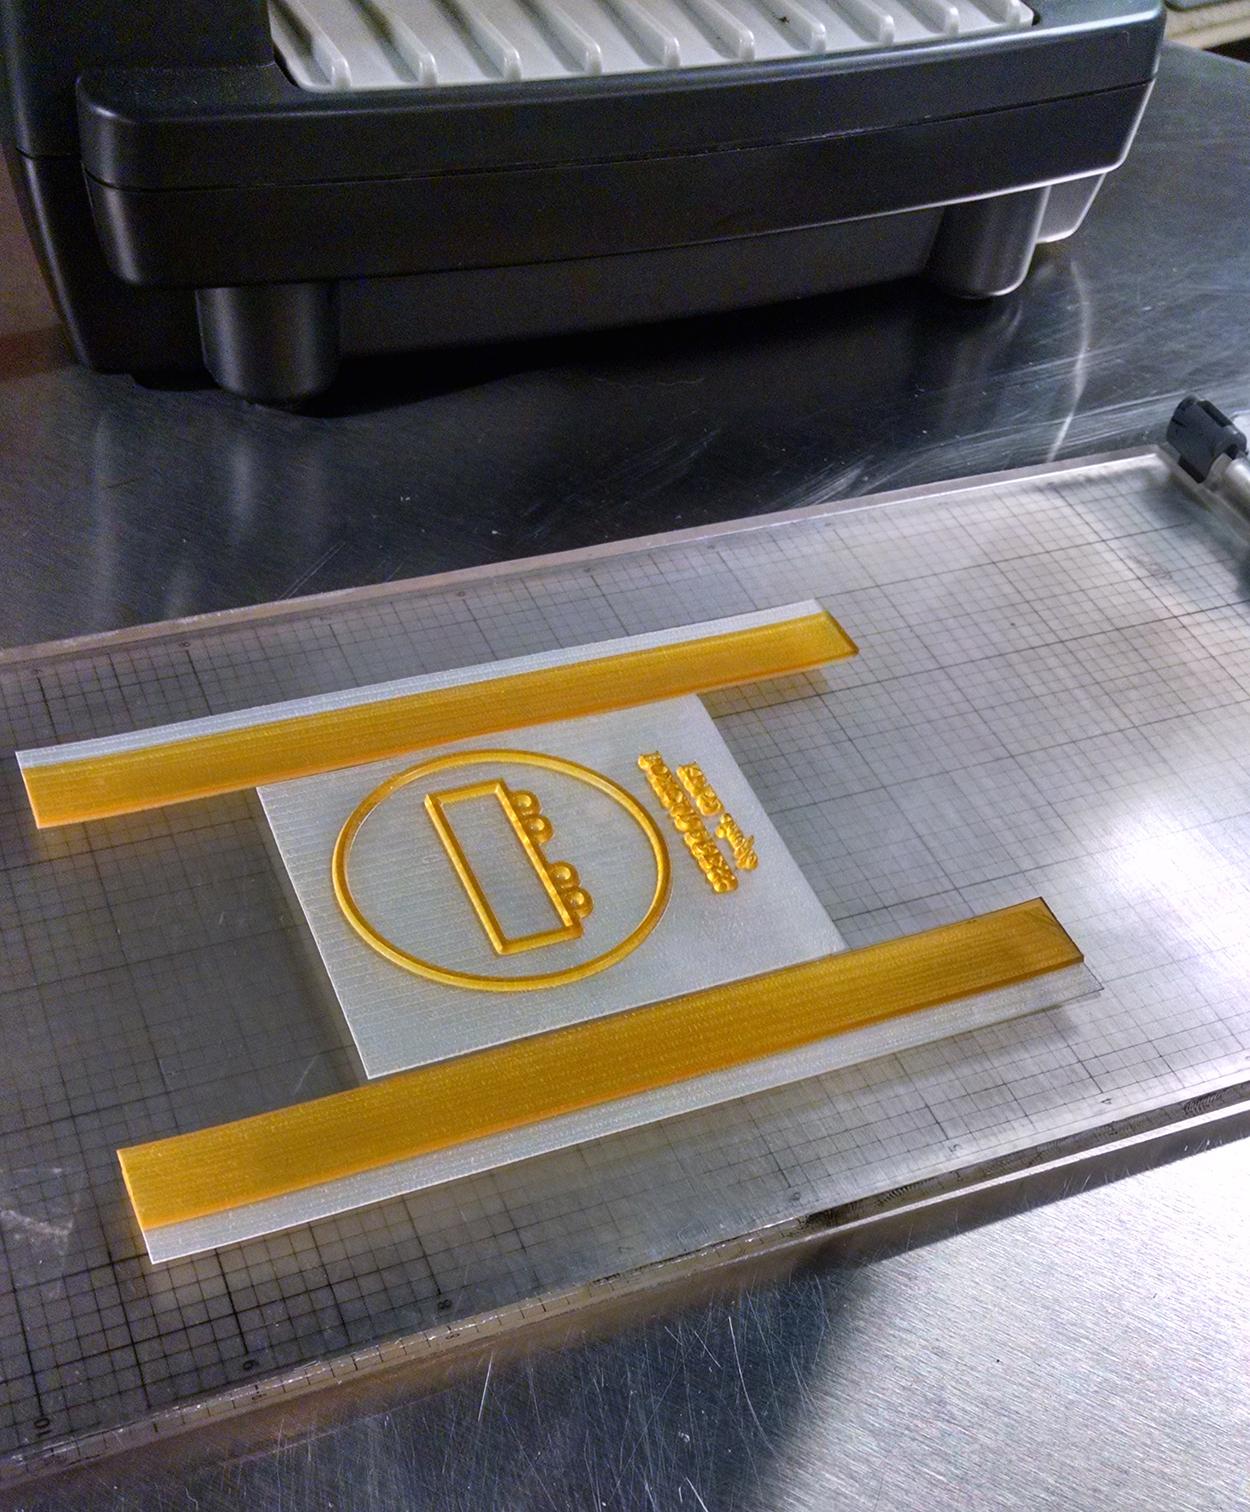 L Letterpress DIY letterpress printing photopolymer printing plate with inking roller bearer strips.